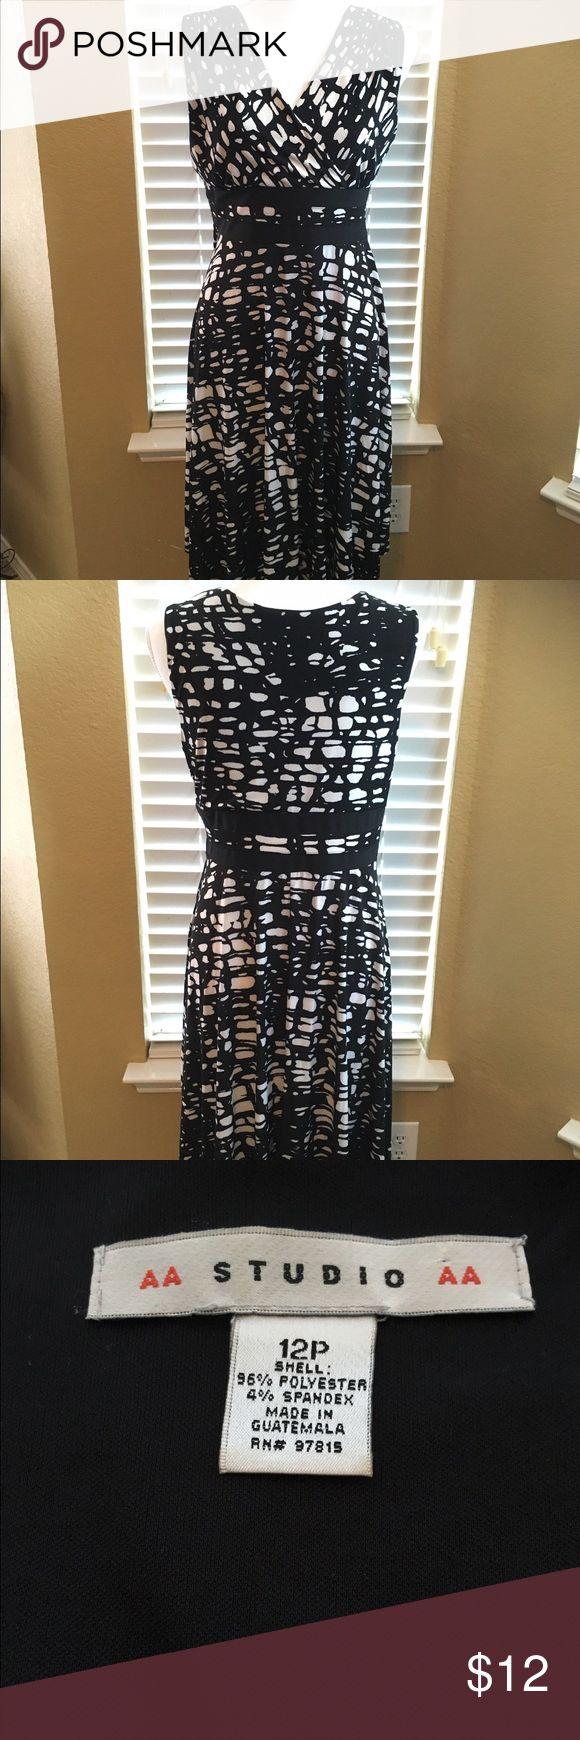 NWOT classic black & white dress V neck black & white fun print dress with slim design waistline made of polyester spandex blend Dresses